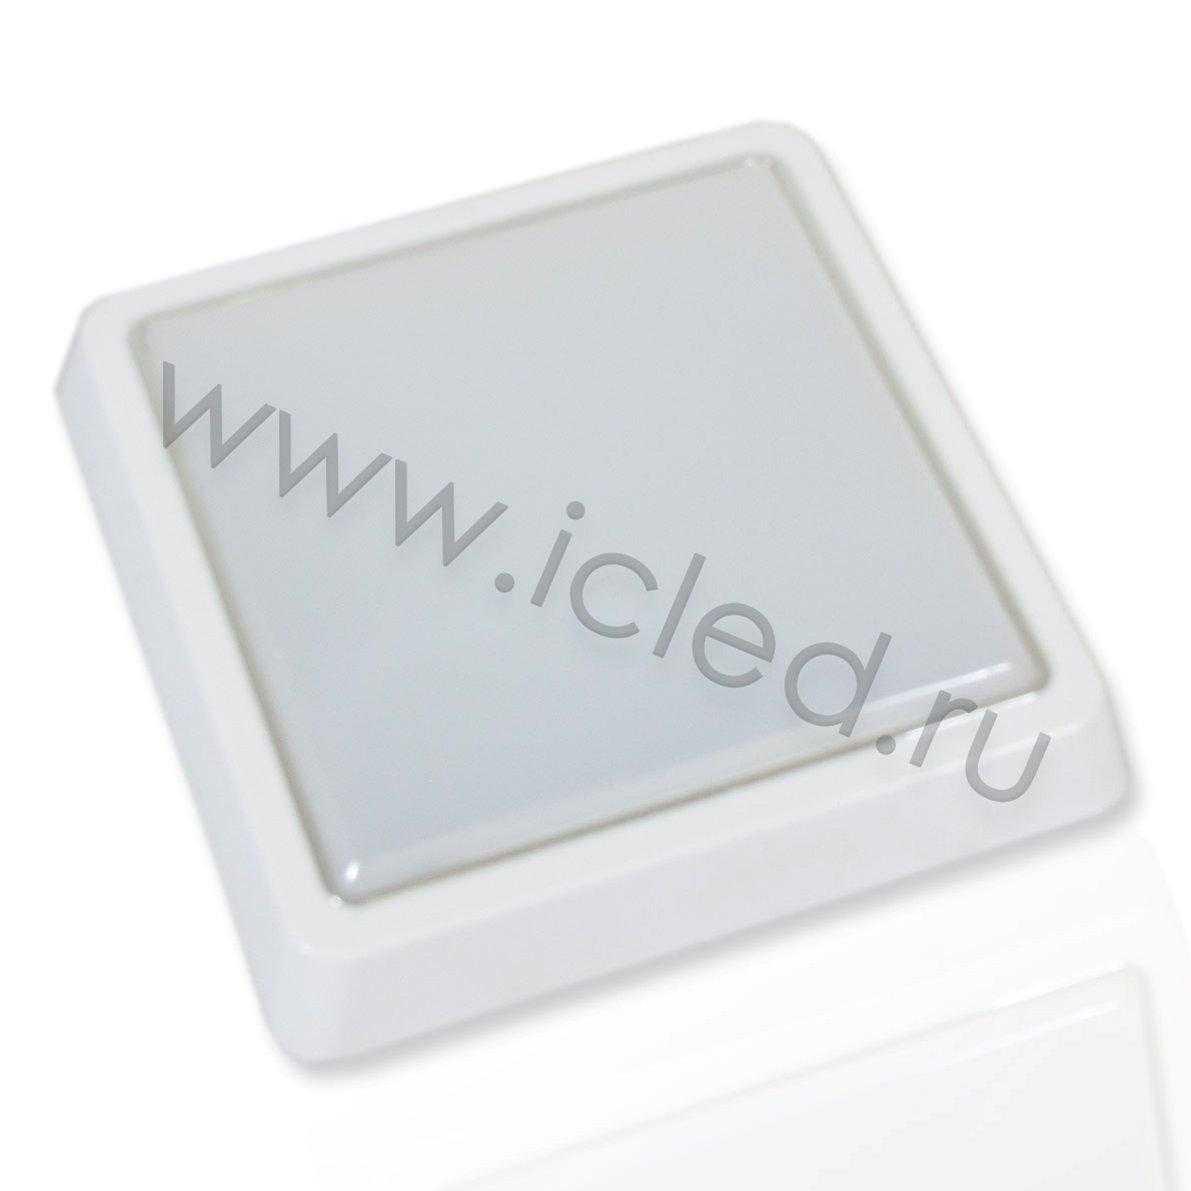 Светодиодный светильник MR-SW L180 (8W, Warm White)